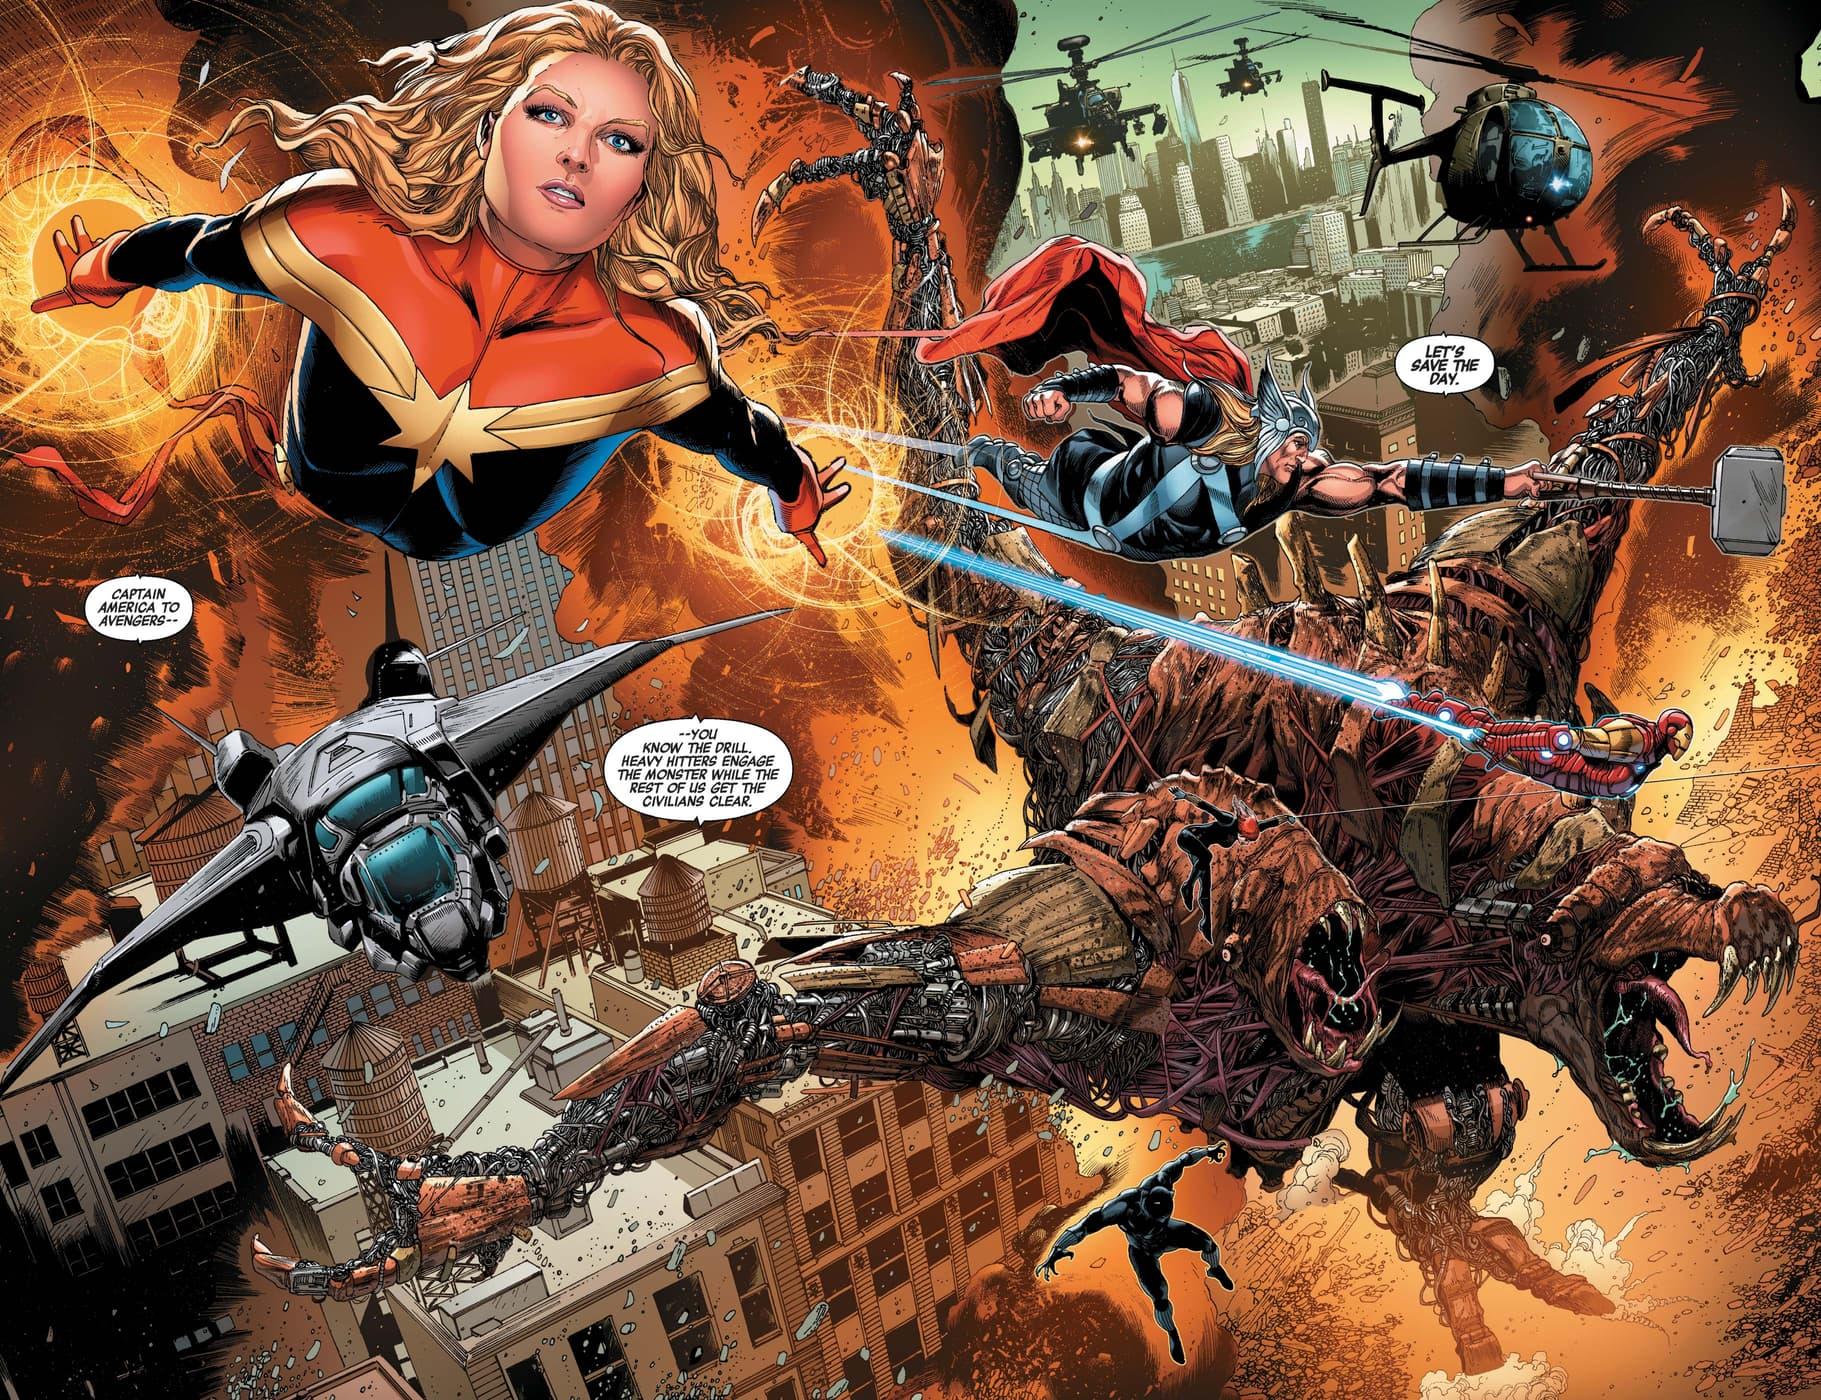 Avengers assemble against a biomechanoid menace.